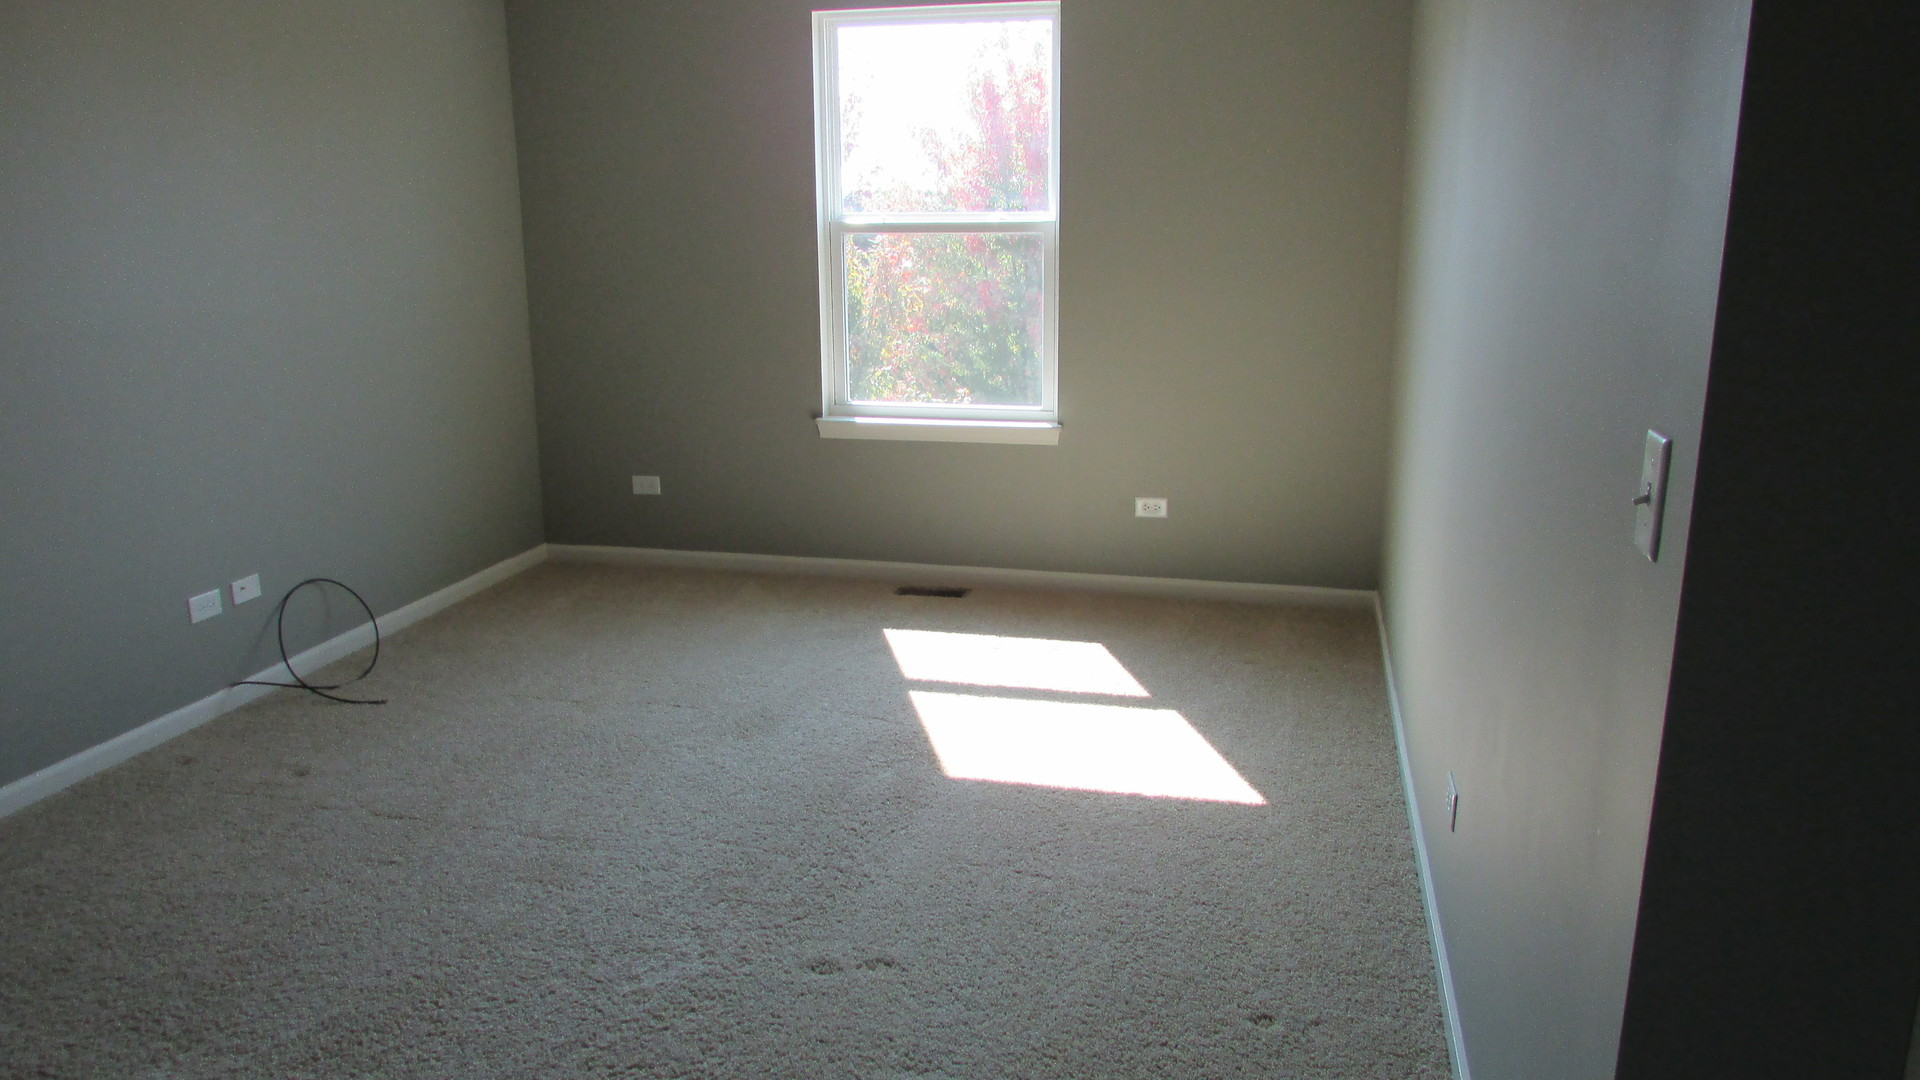 728 goodfield lndg elgin il single family home property listing